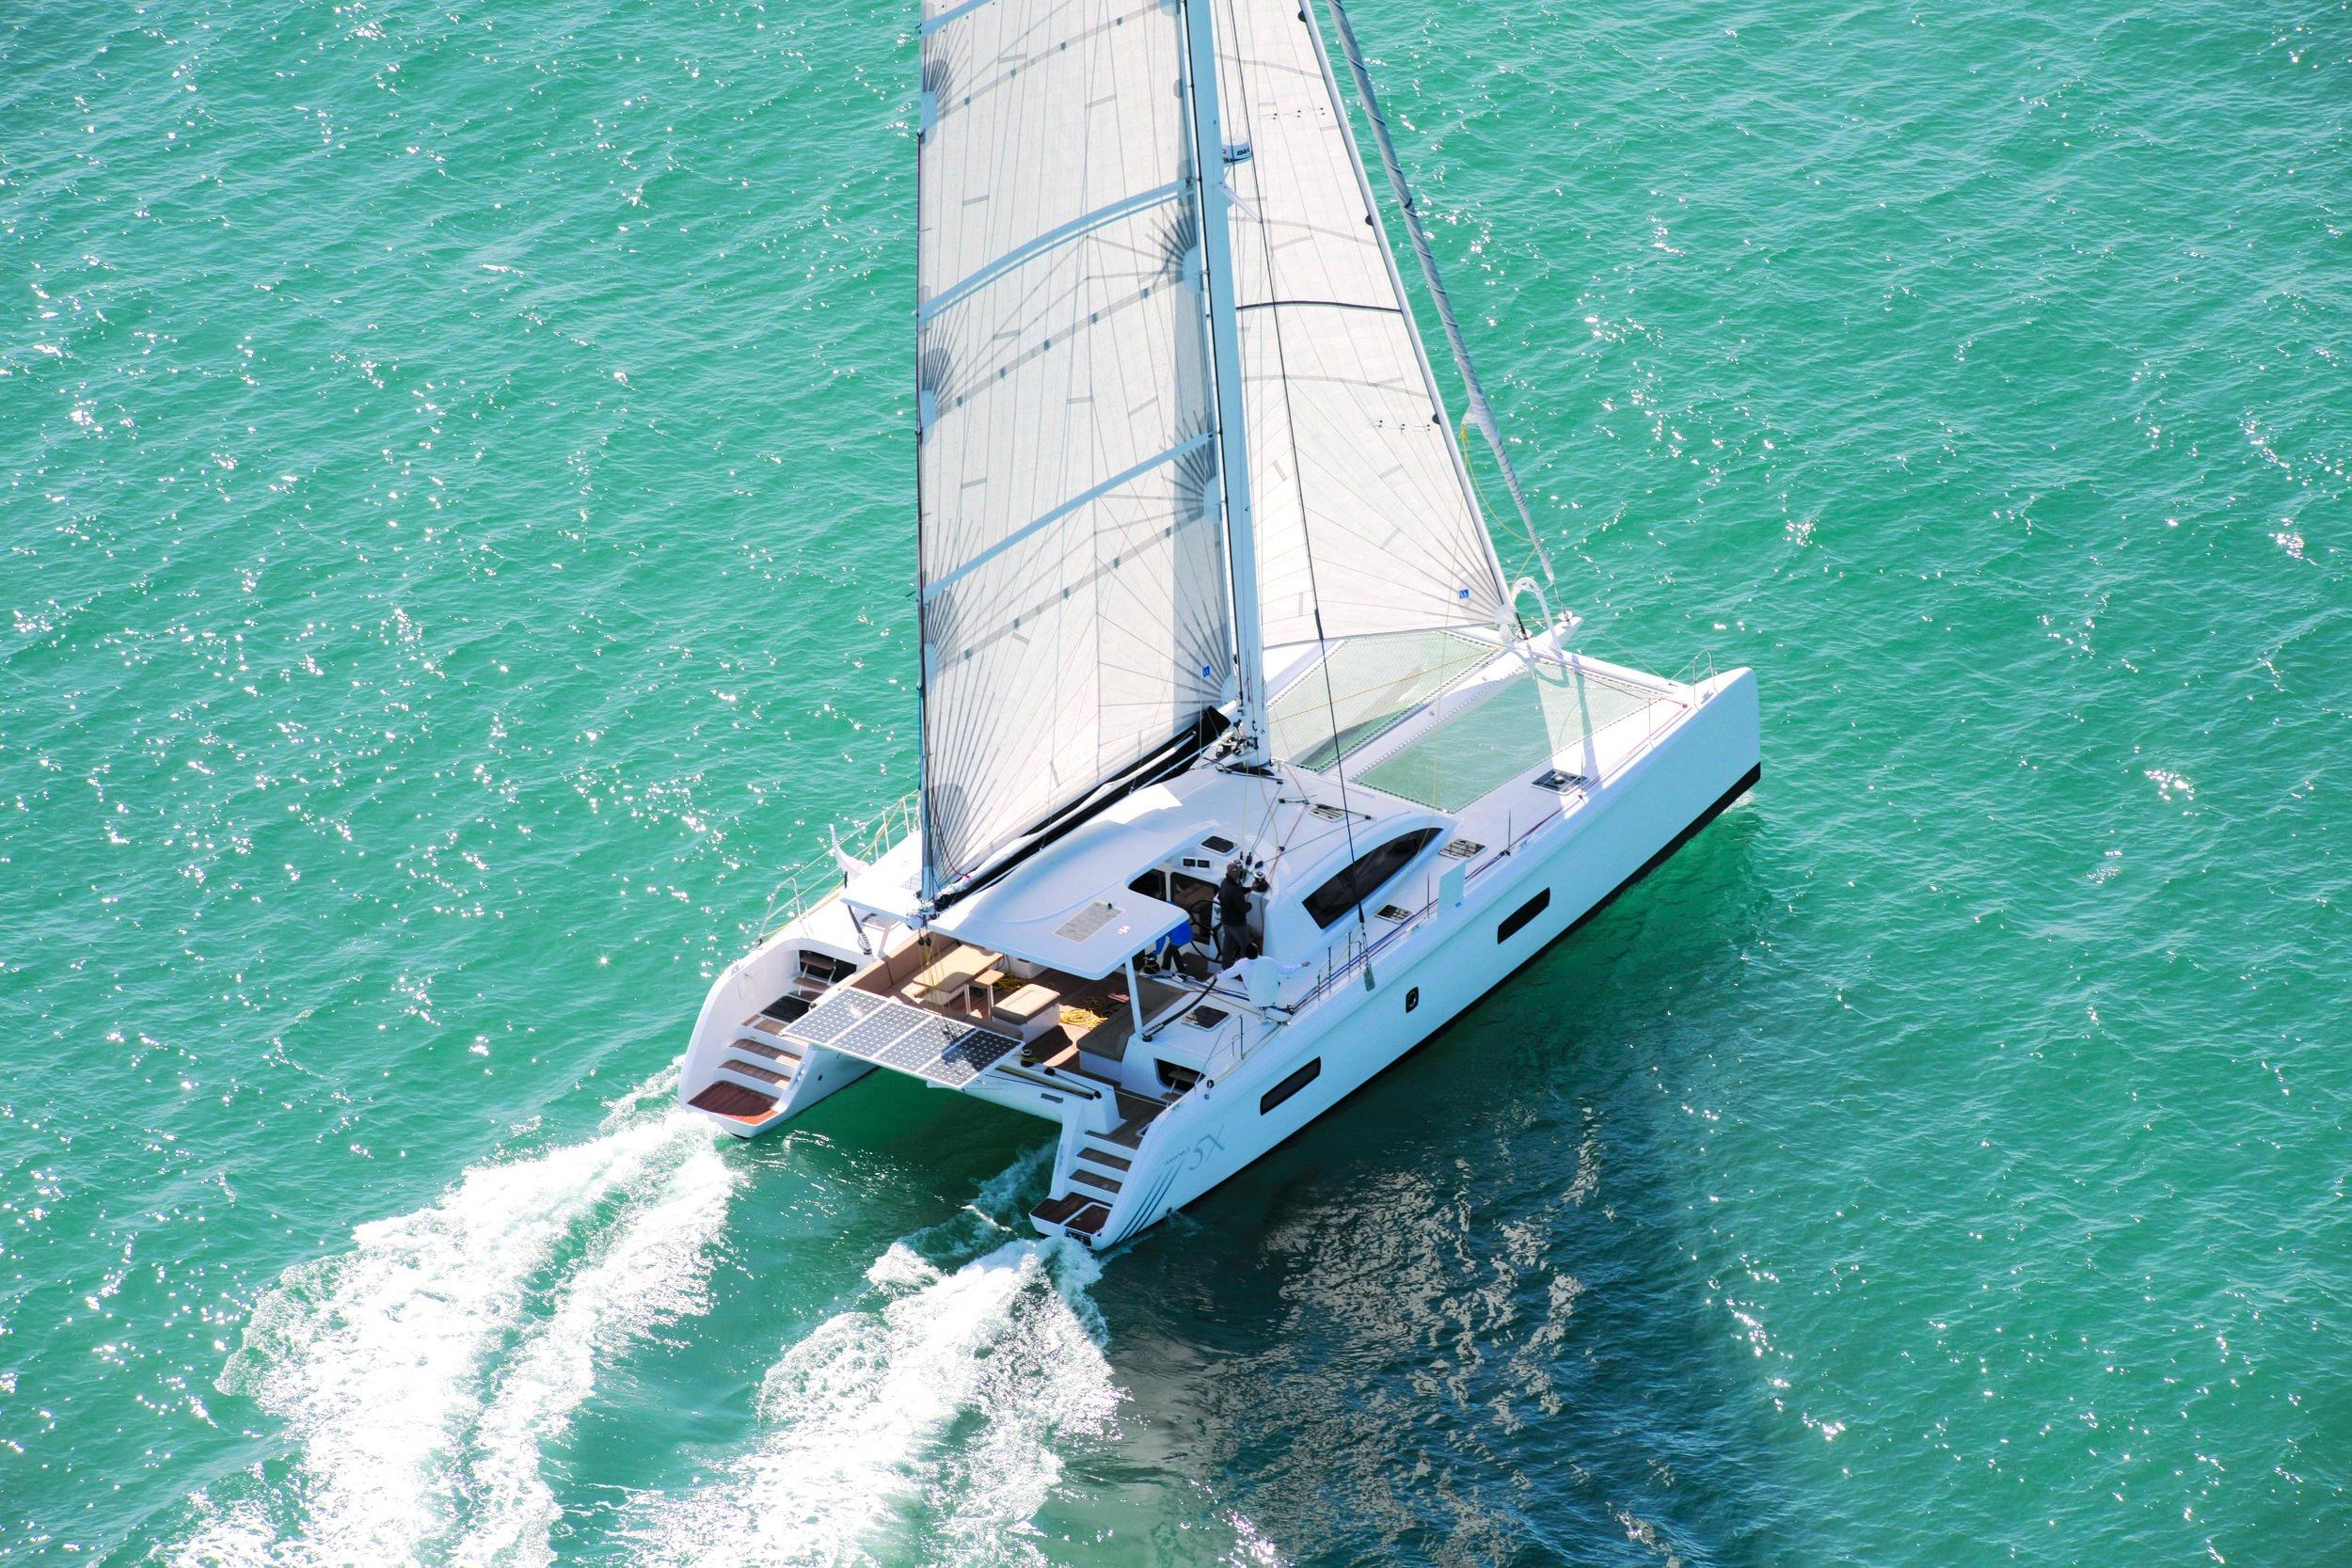 outremer_catamaran_5x_grand_voyage-1.jpg